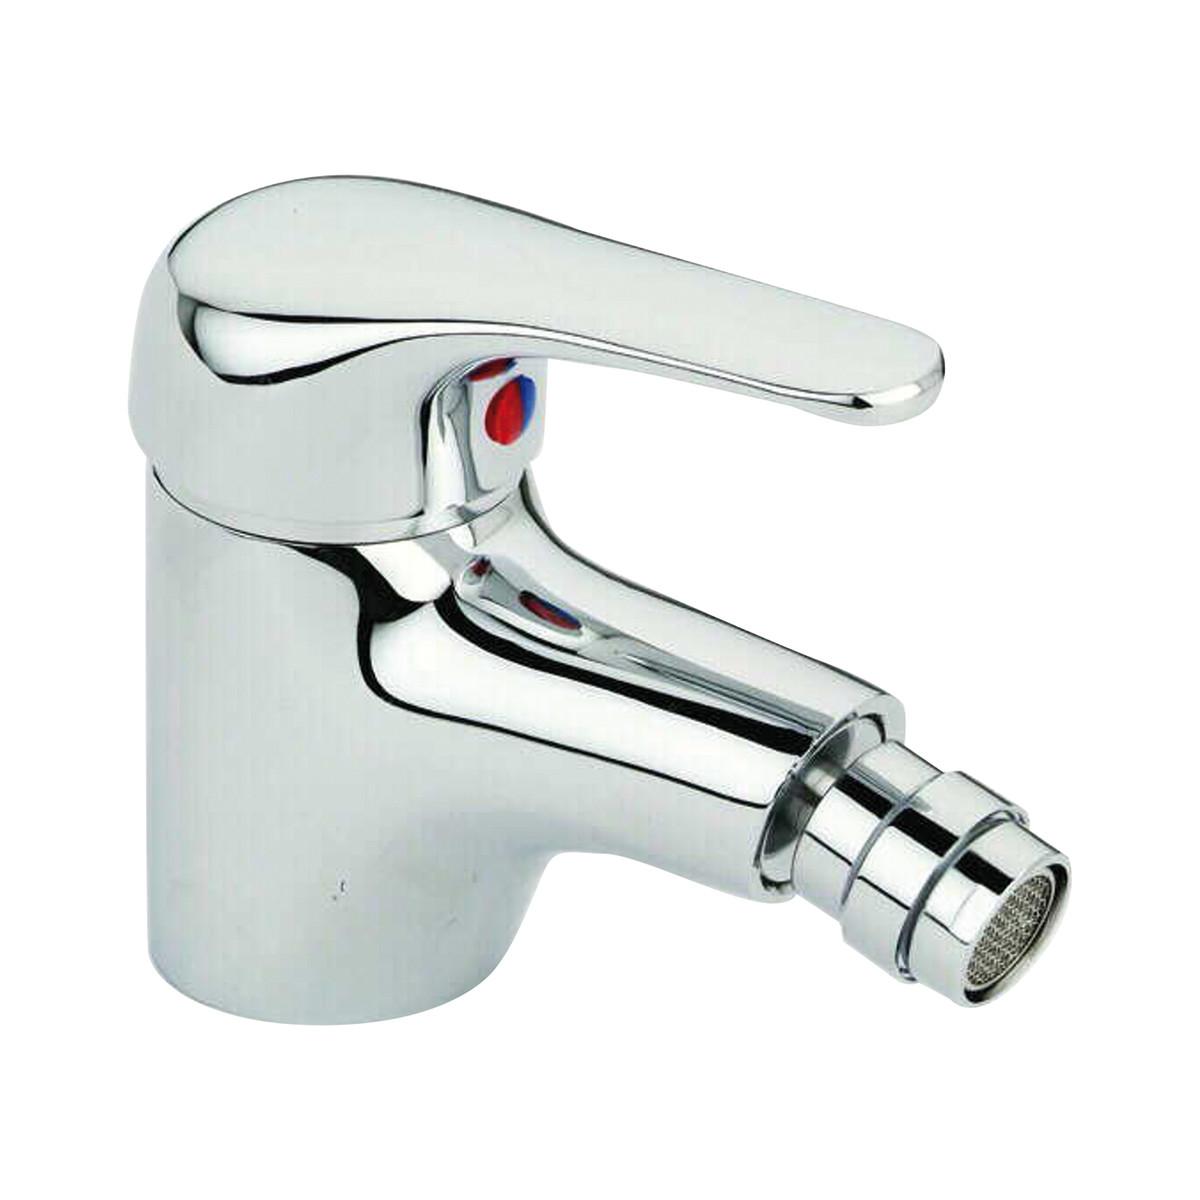 Costo rubinetto bagno interesting duplice miscelatore for Miscelatore cucina leroy merlin